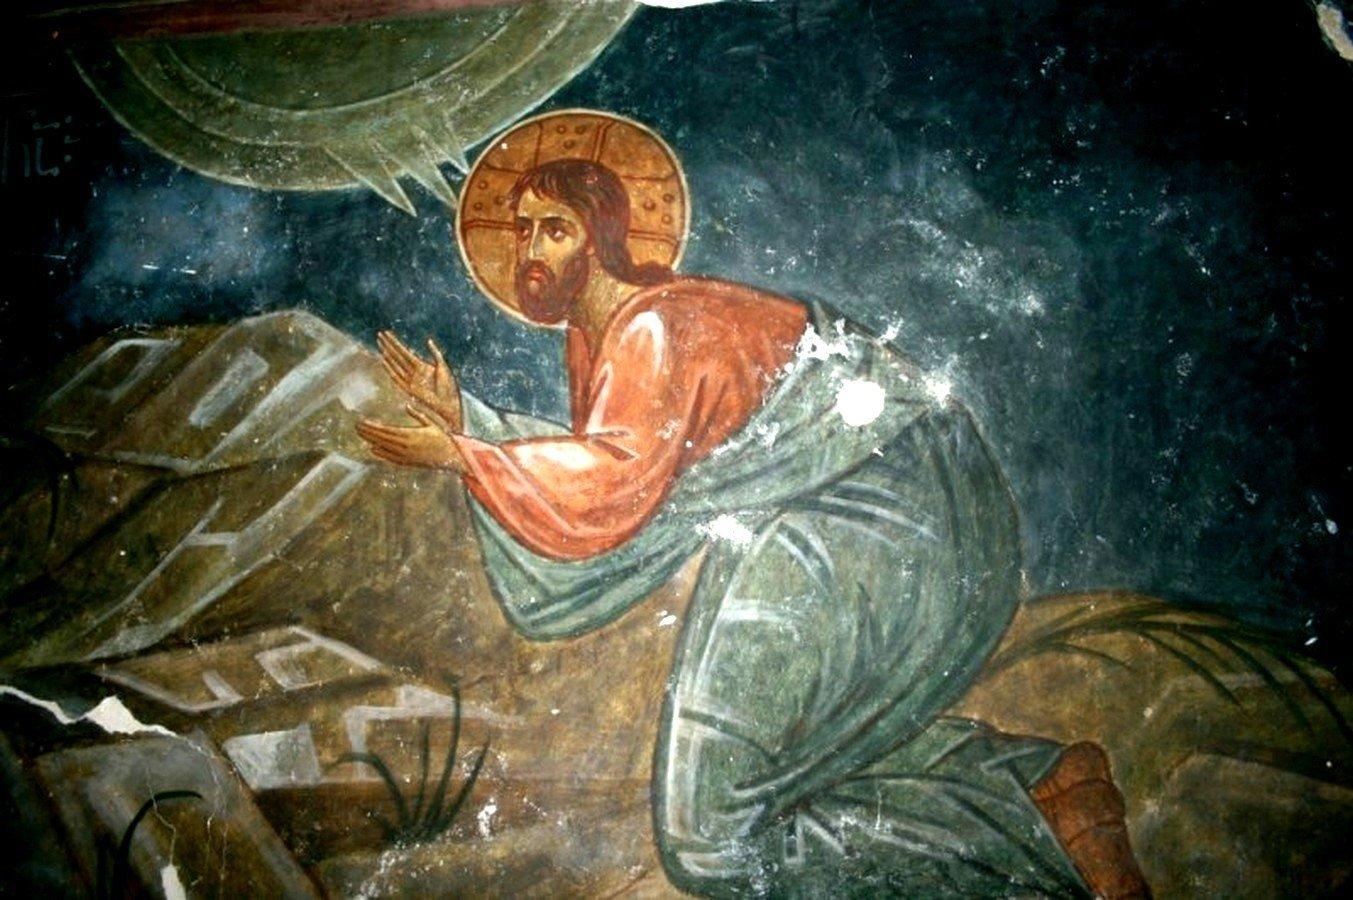 Моление о Чаше. Фреска монастыря Зарзма, Грузия. Середина XIV века.